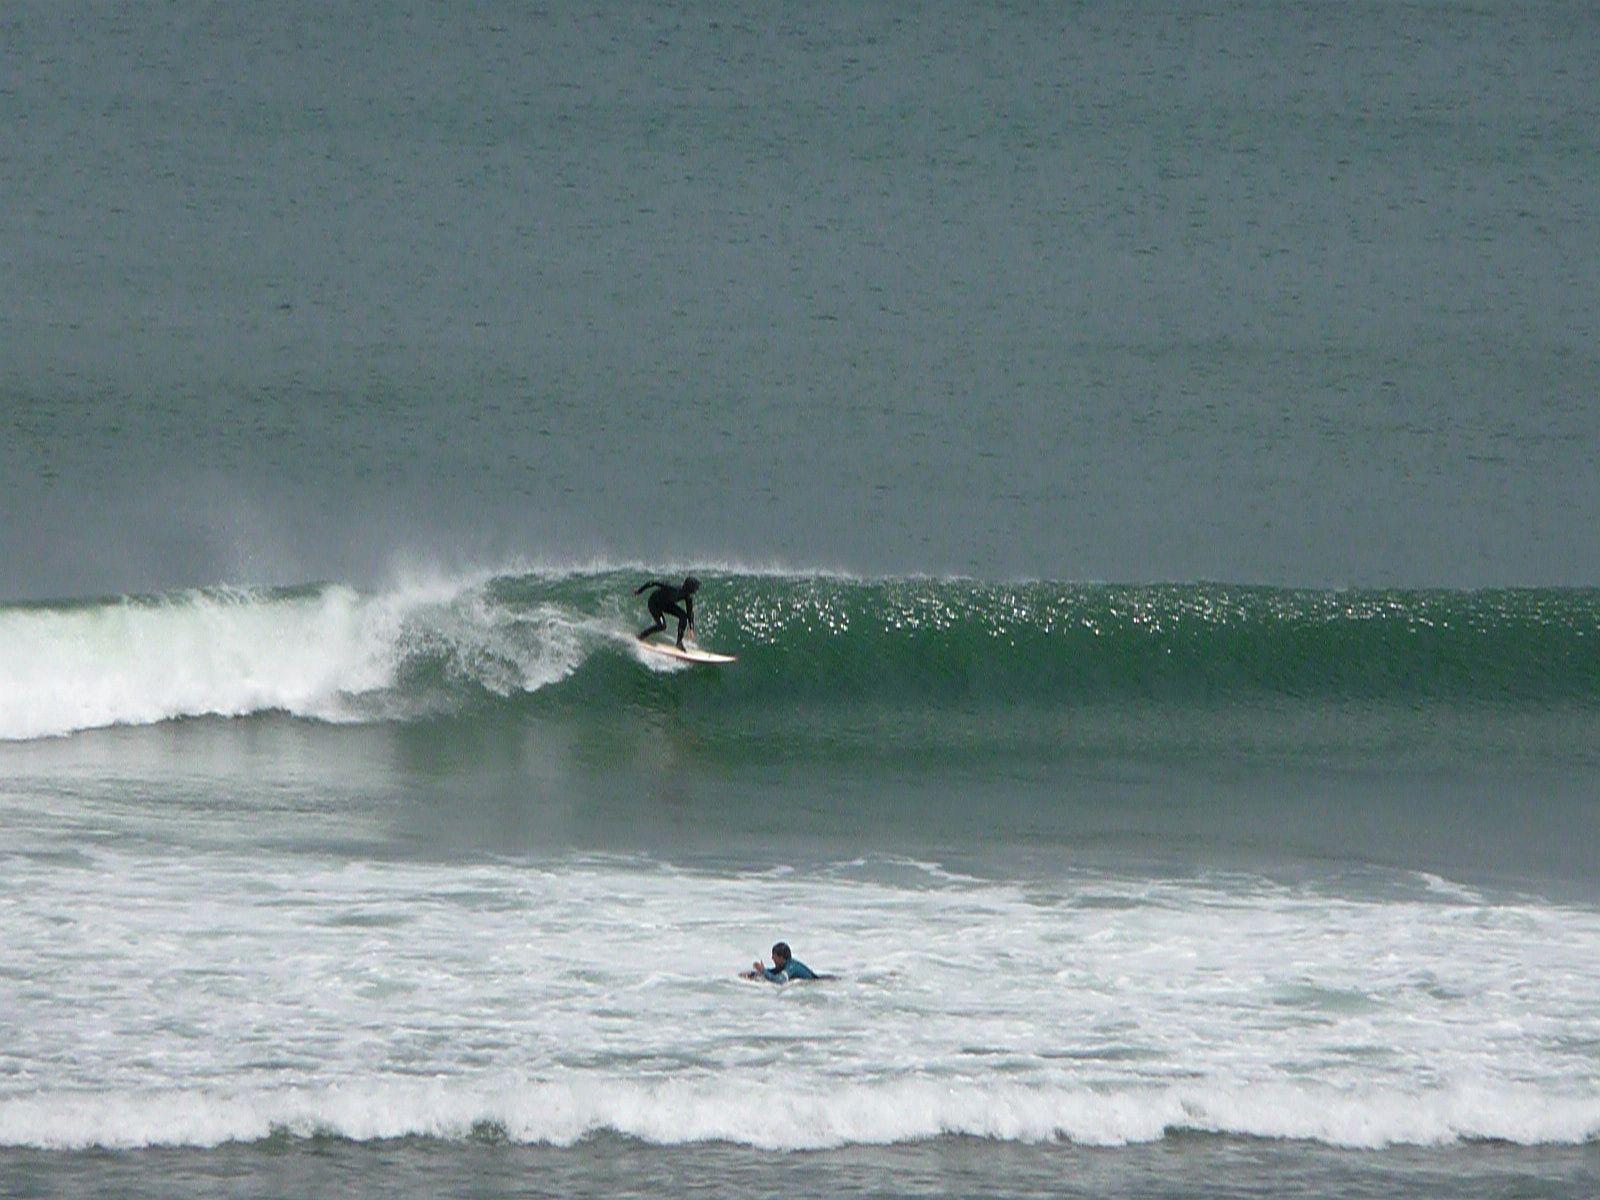 Surf en Mundaka - Ola de Mundaka - Foto